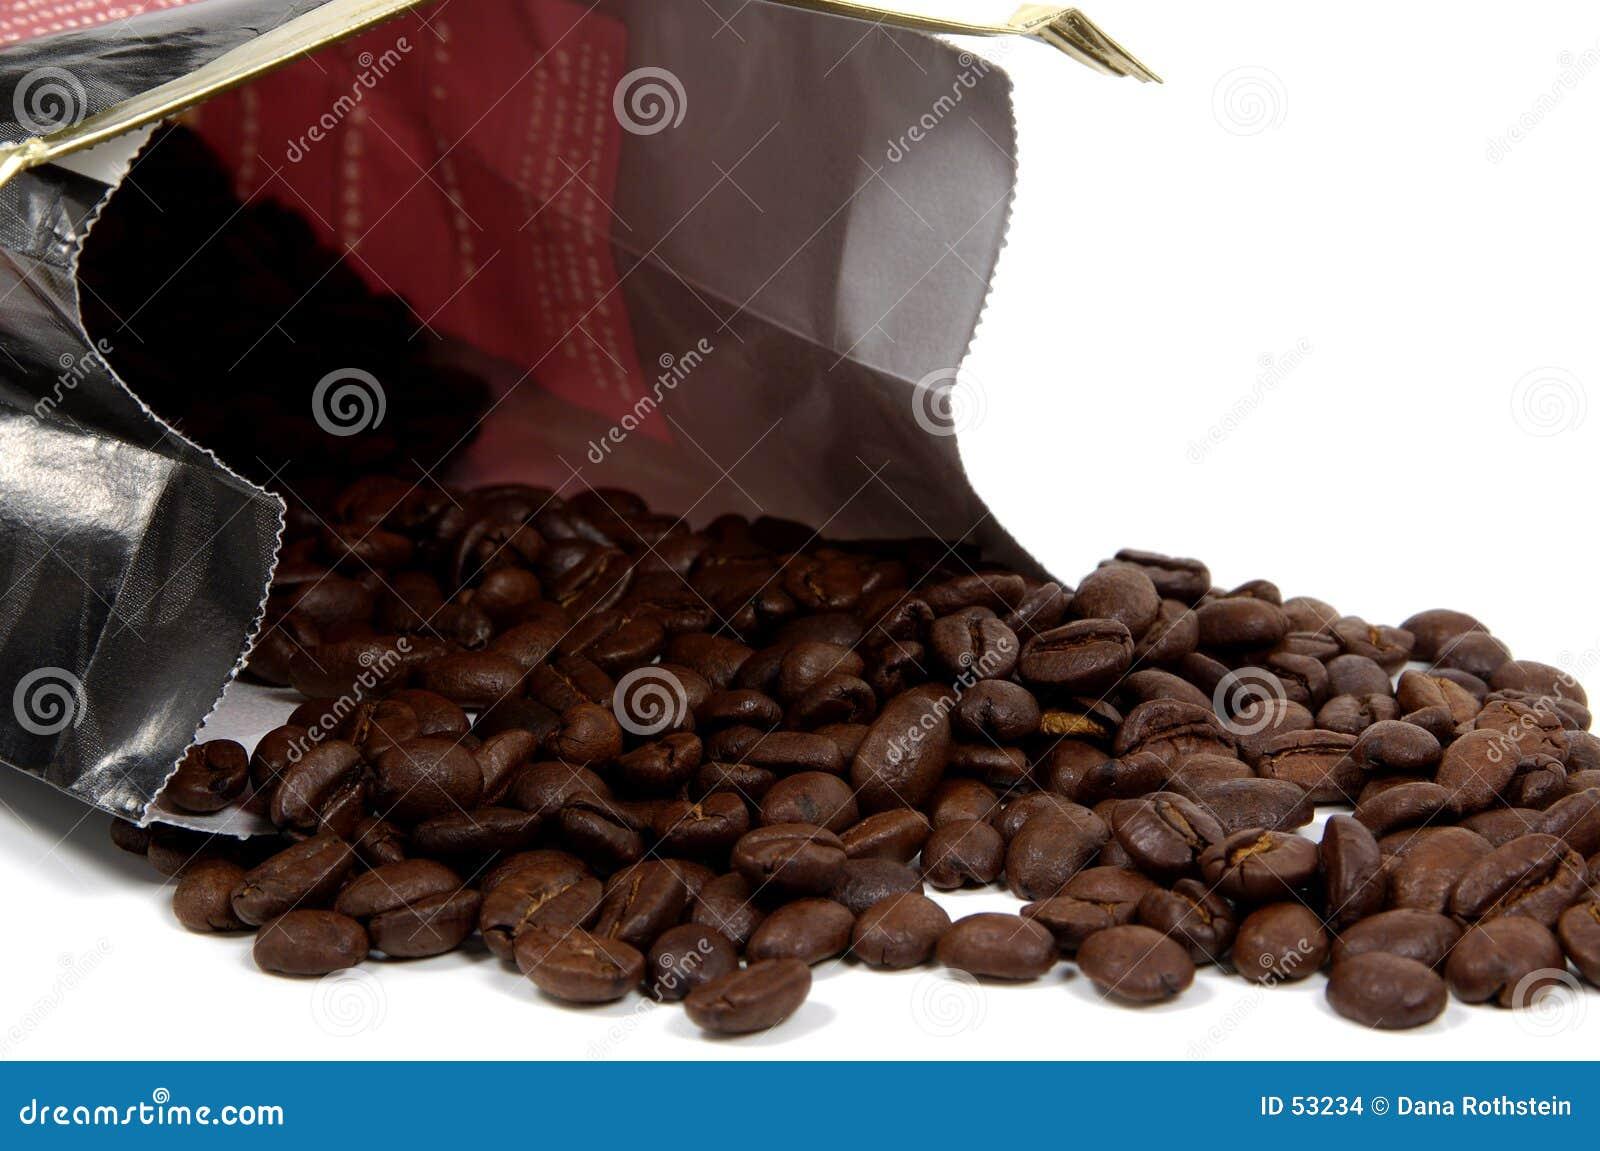 Sacchetto di caffè